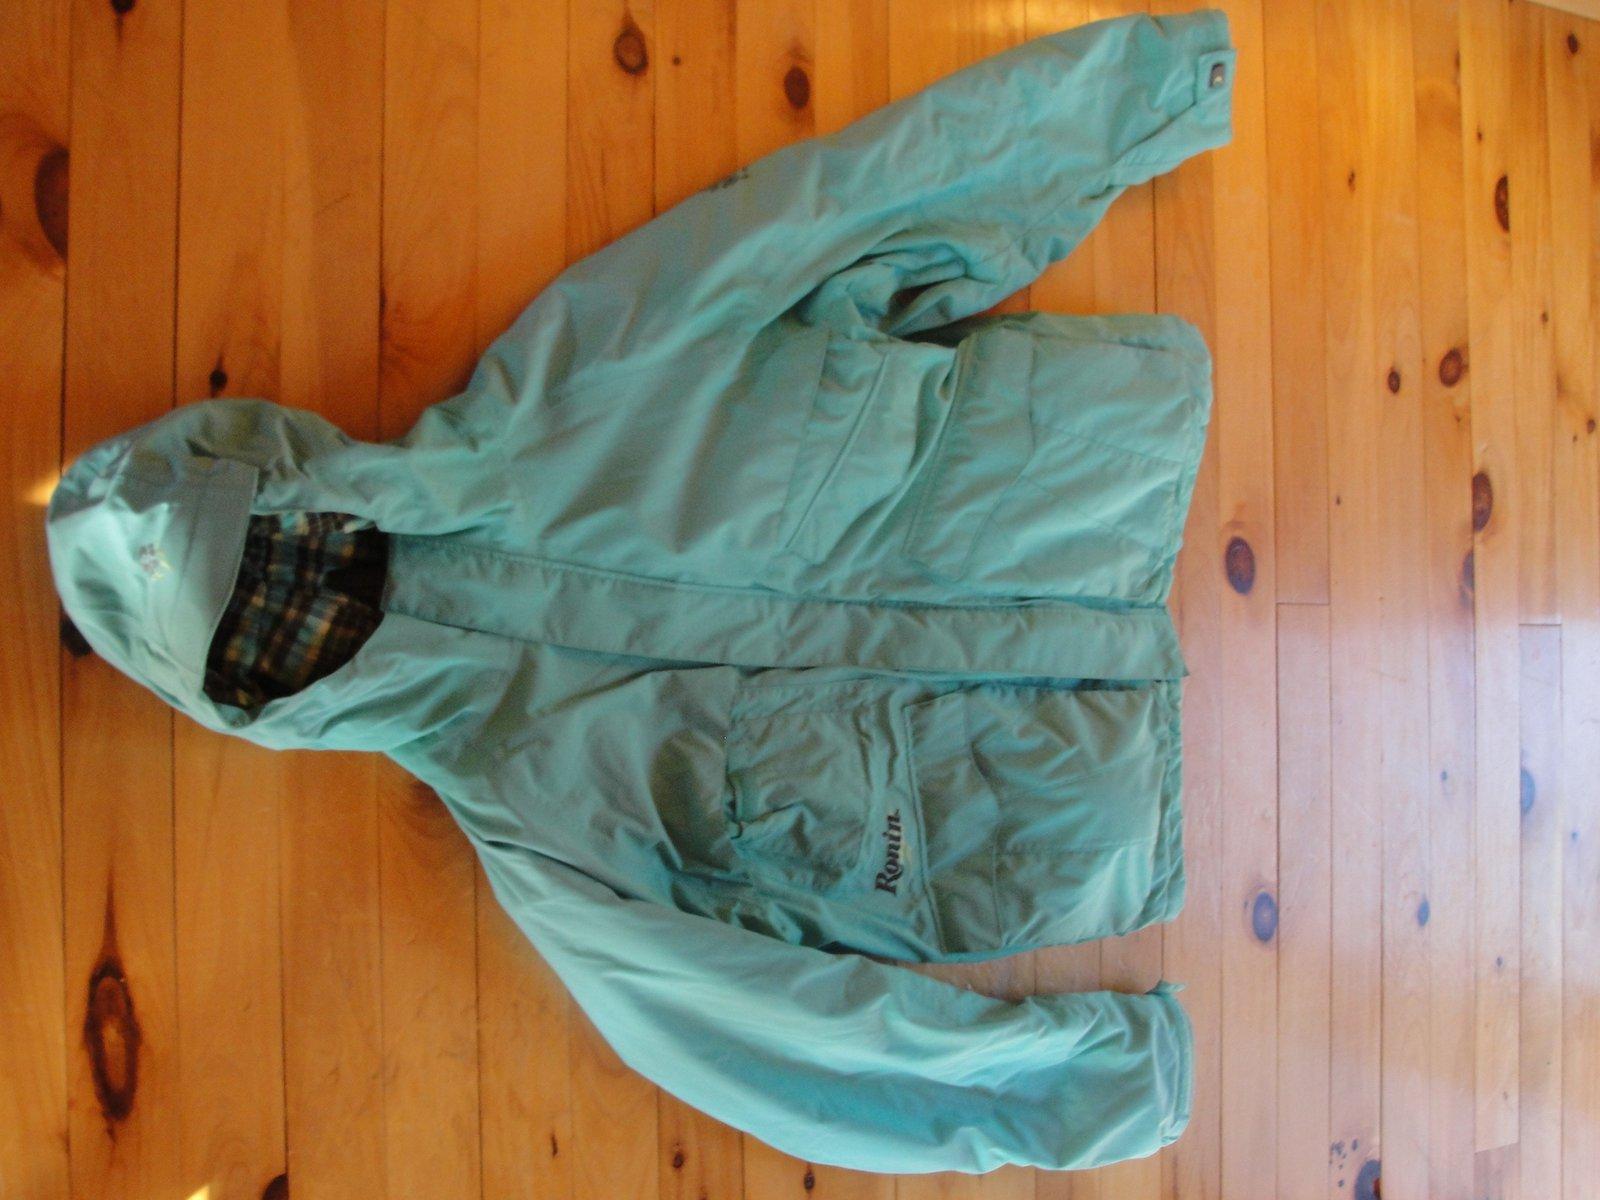 Ronin La Cosa Nostra Jacket For Sale